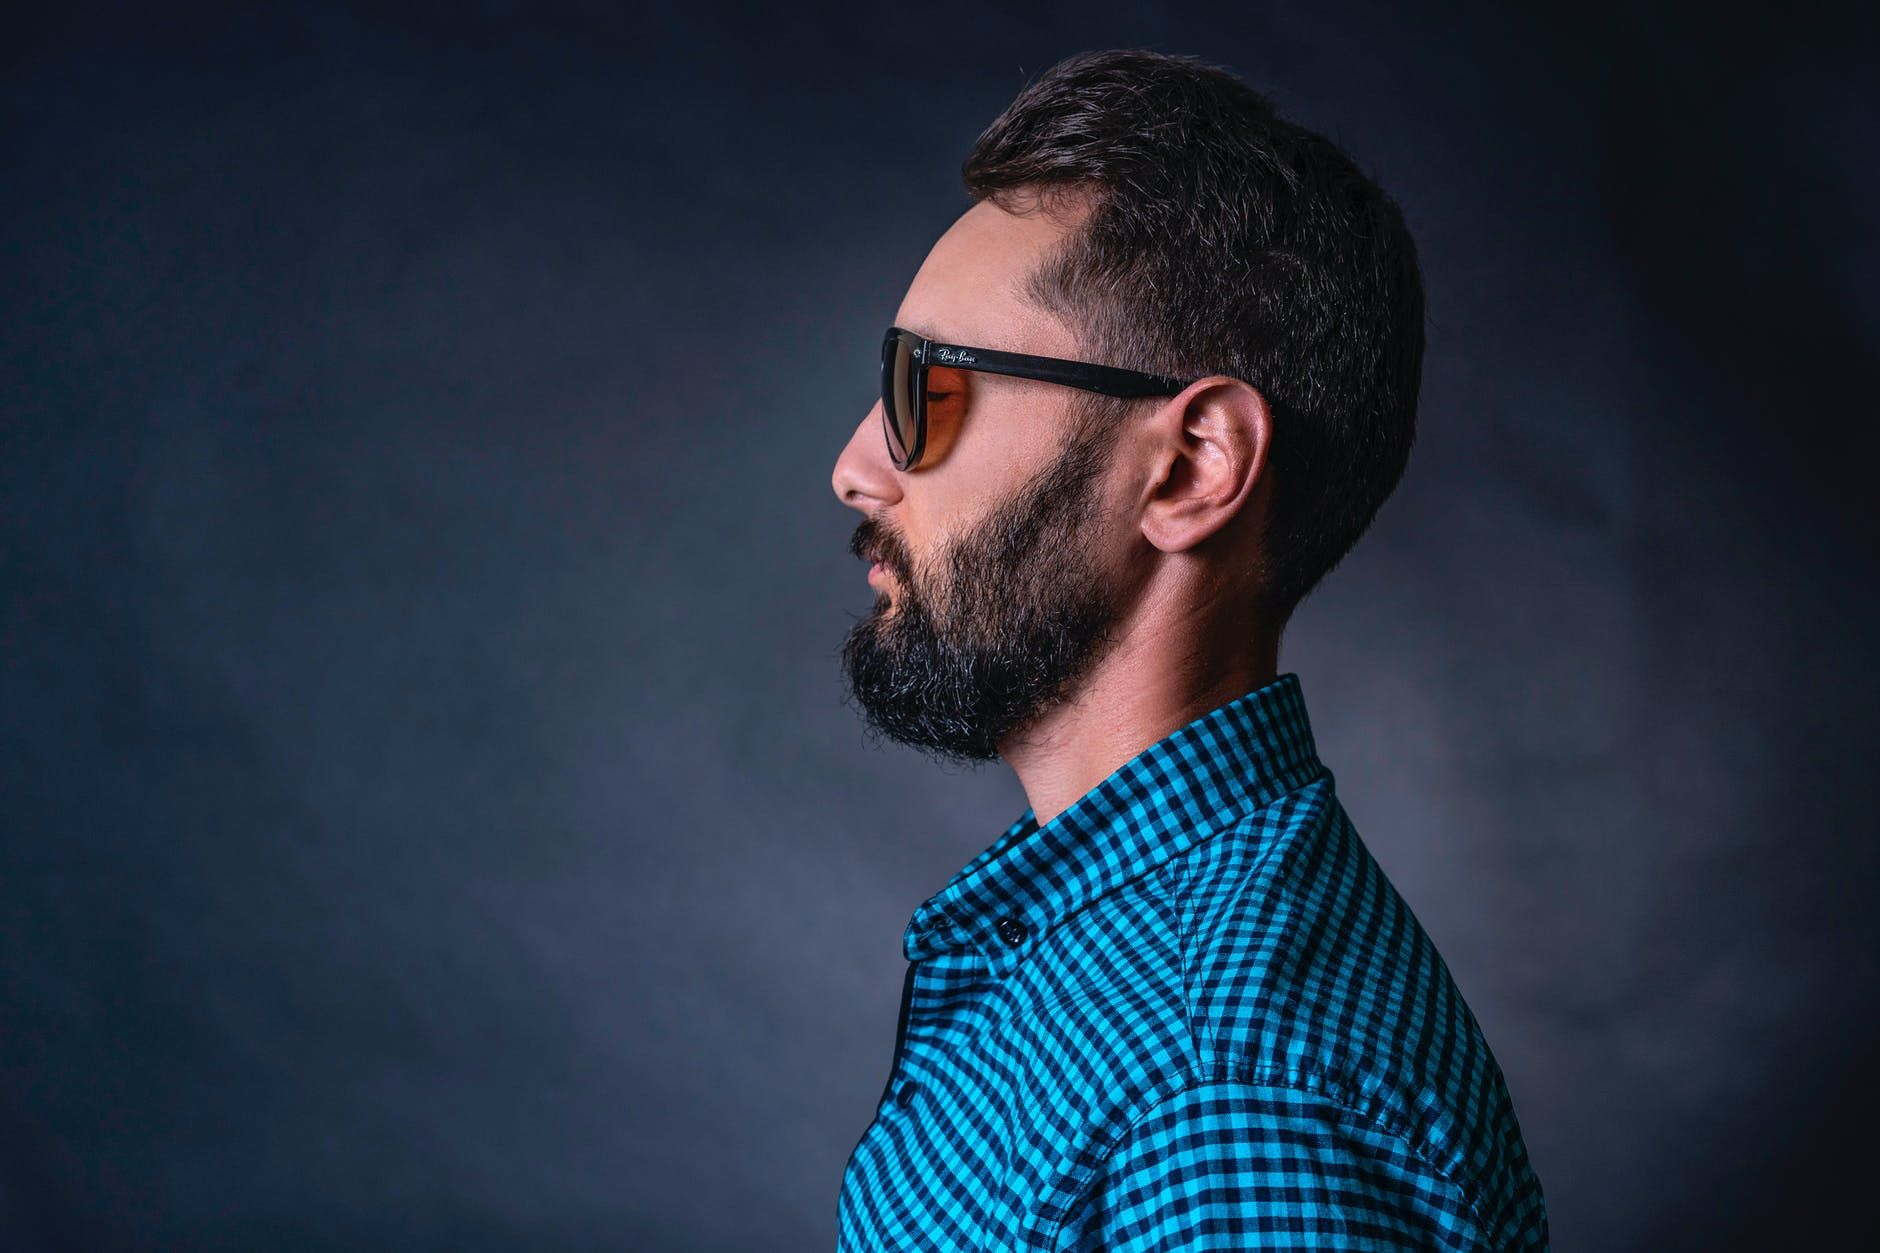 A man wearing a checkered shirt and sunglasses